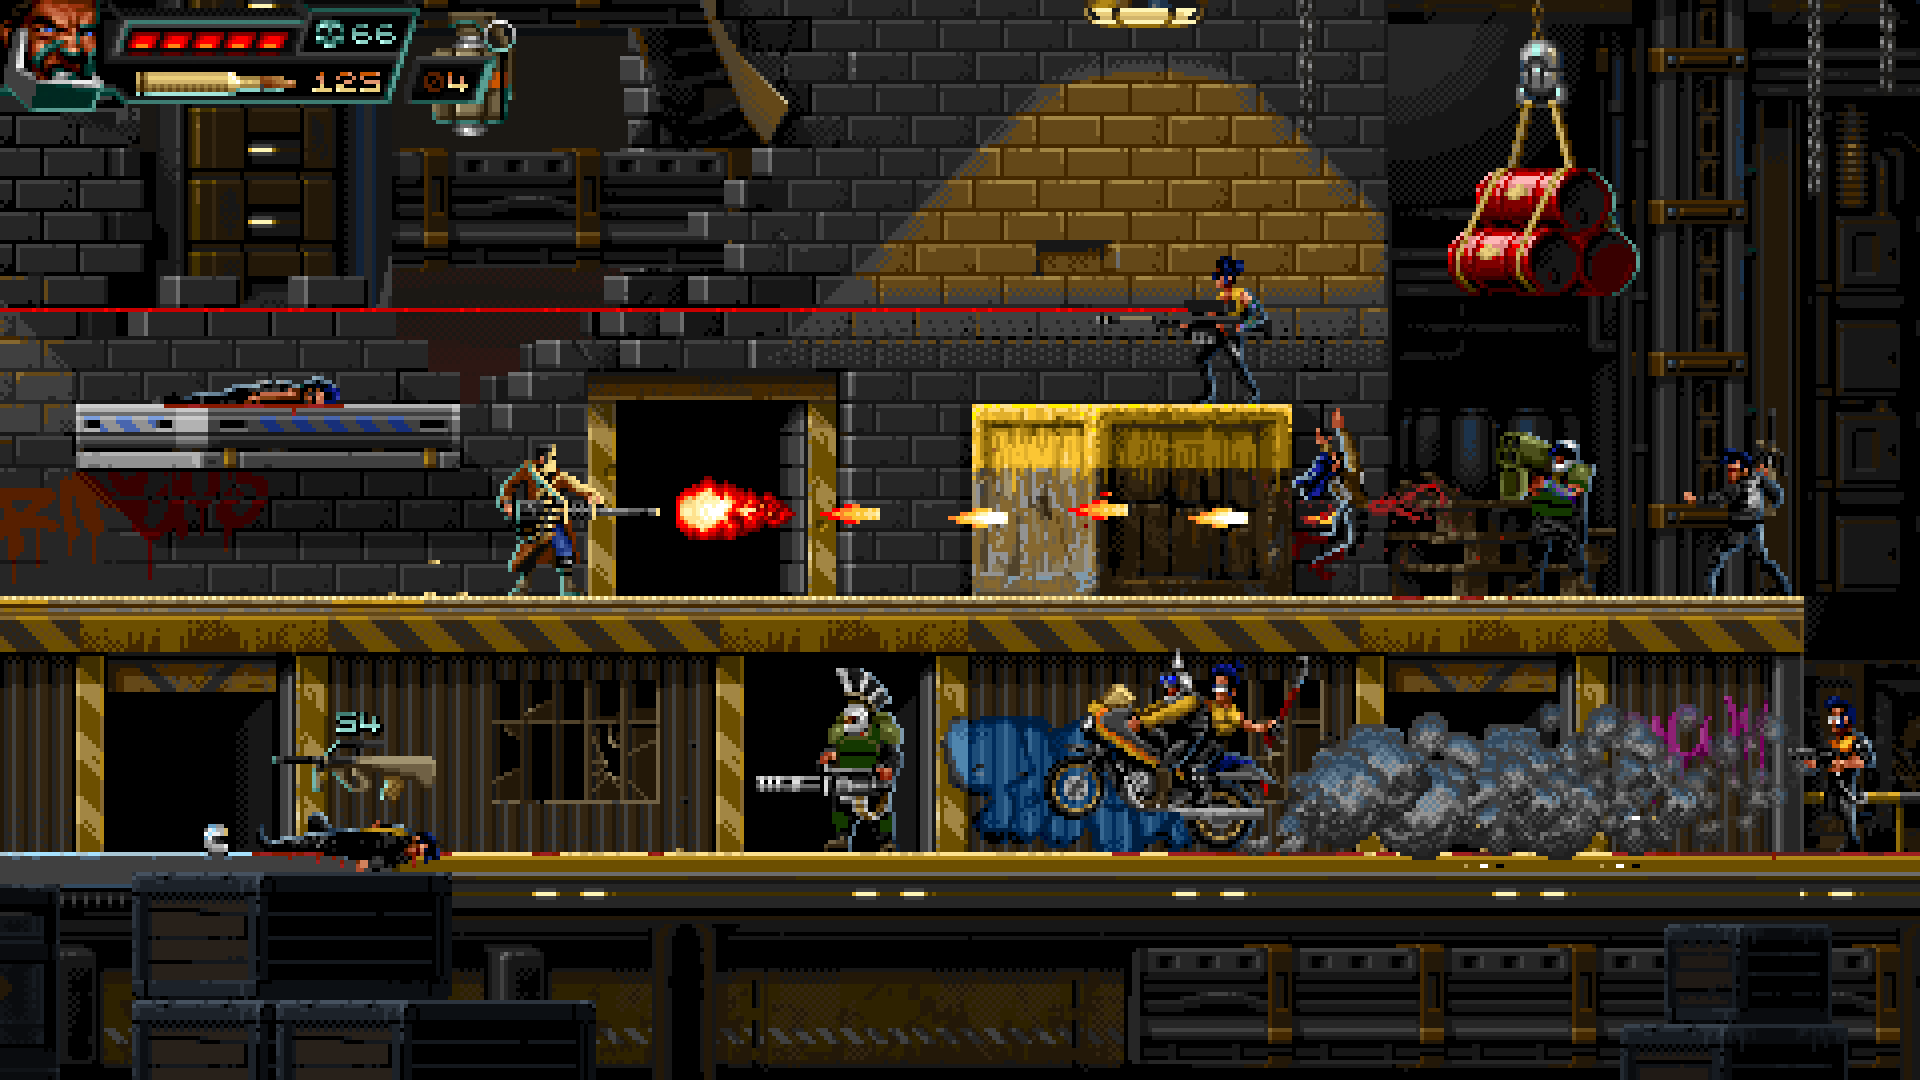 A screenshot from Huntdown